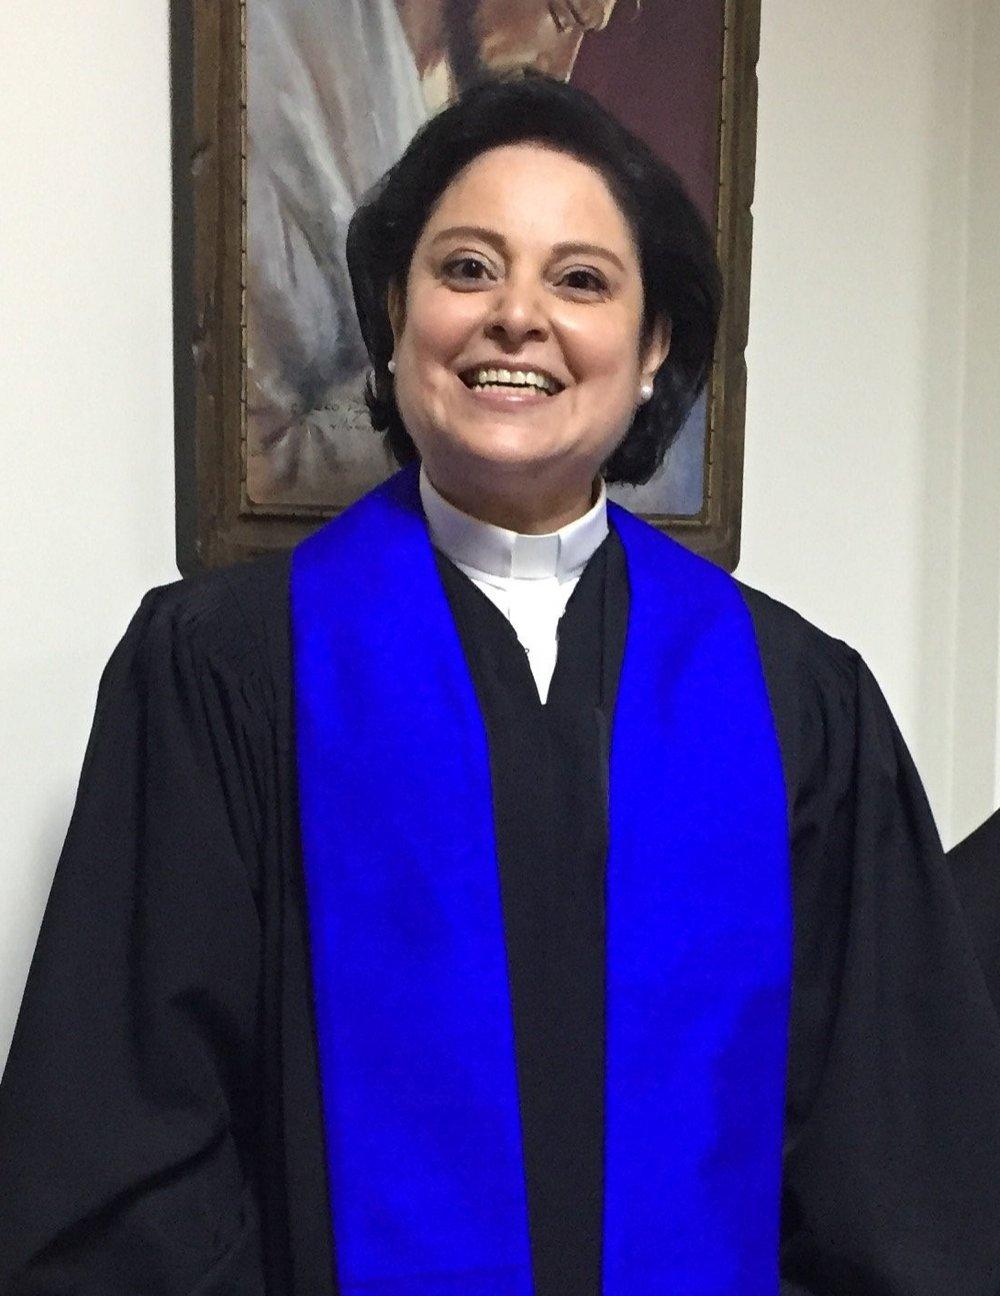 Rev. Kassab